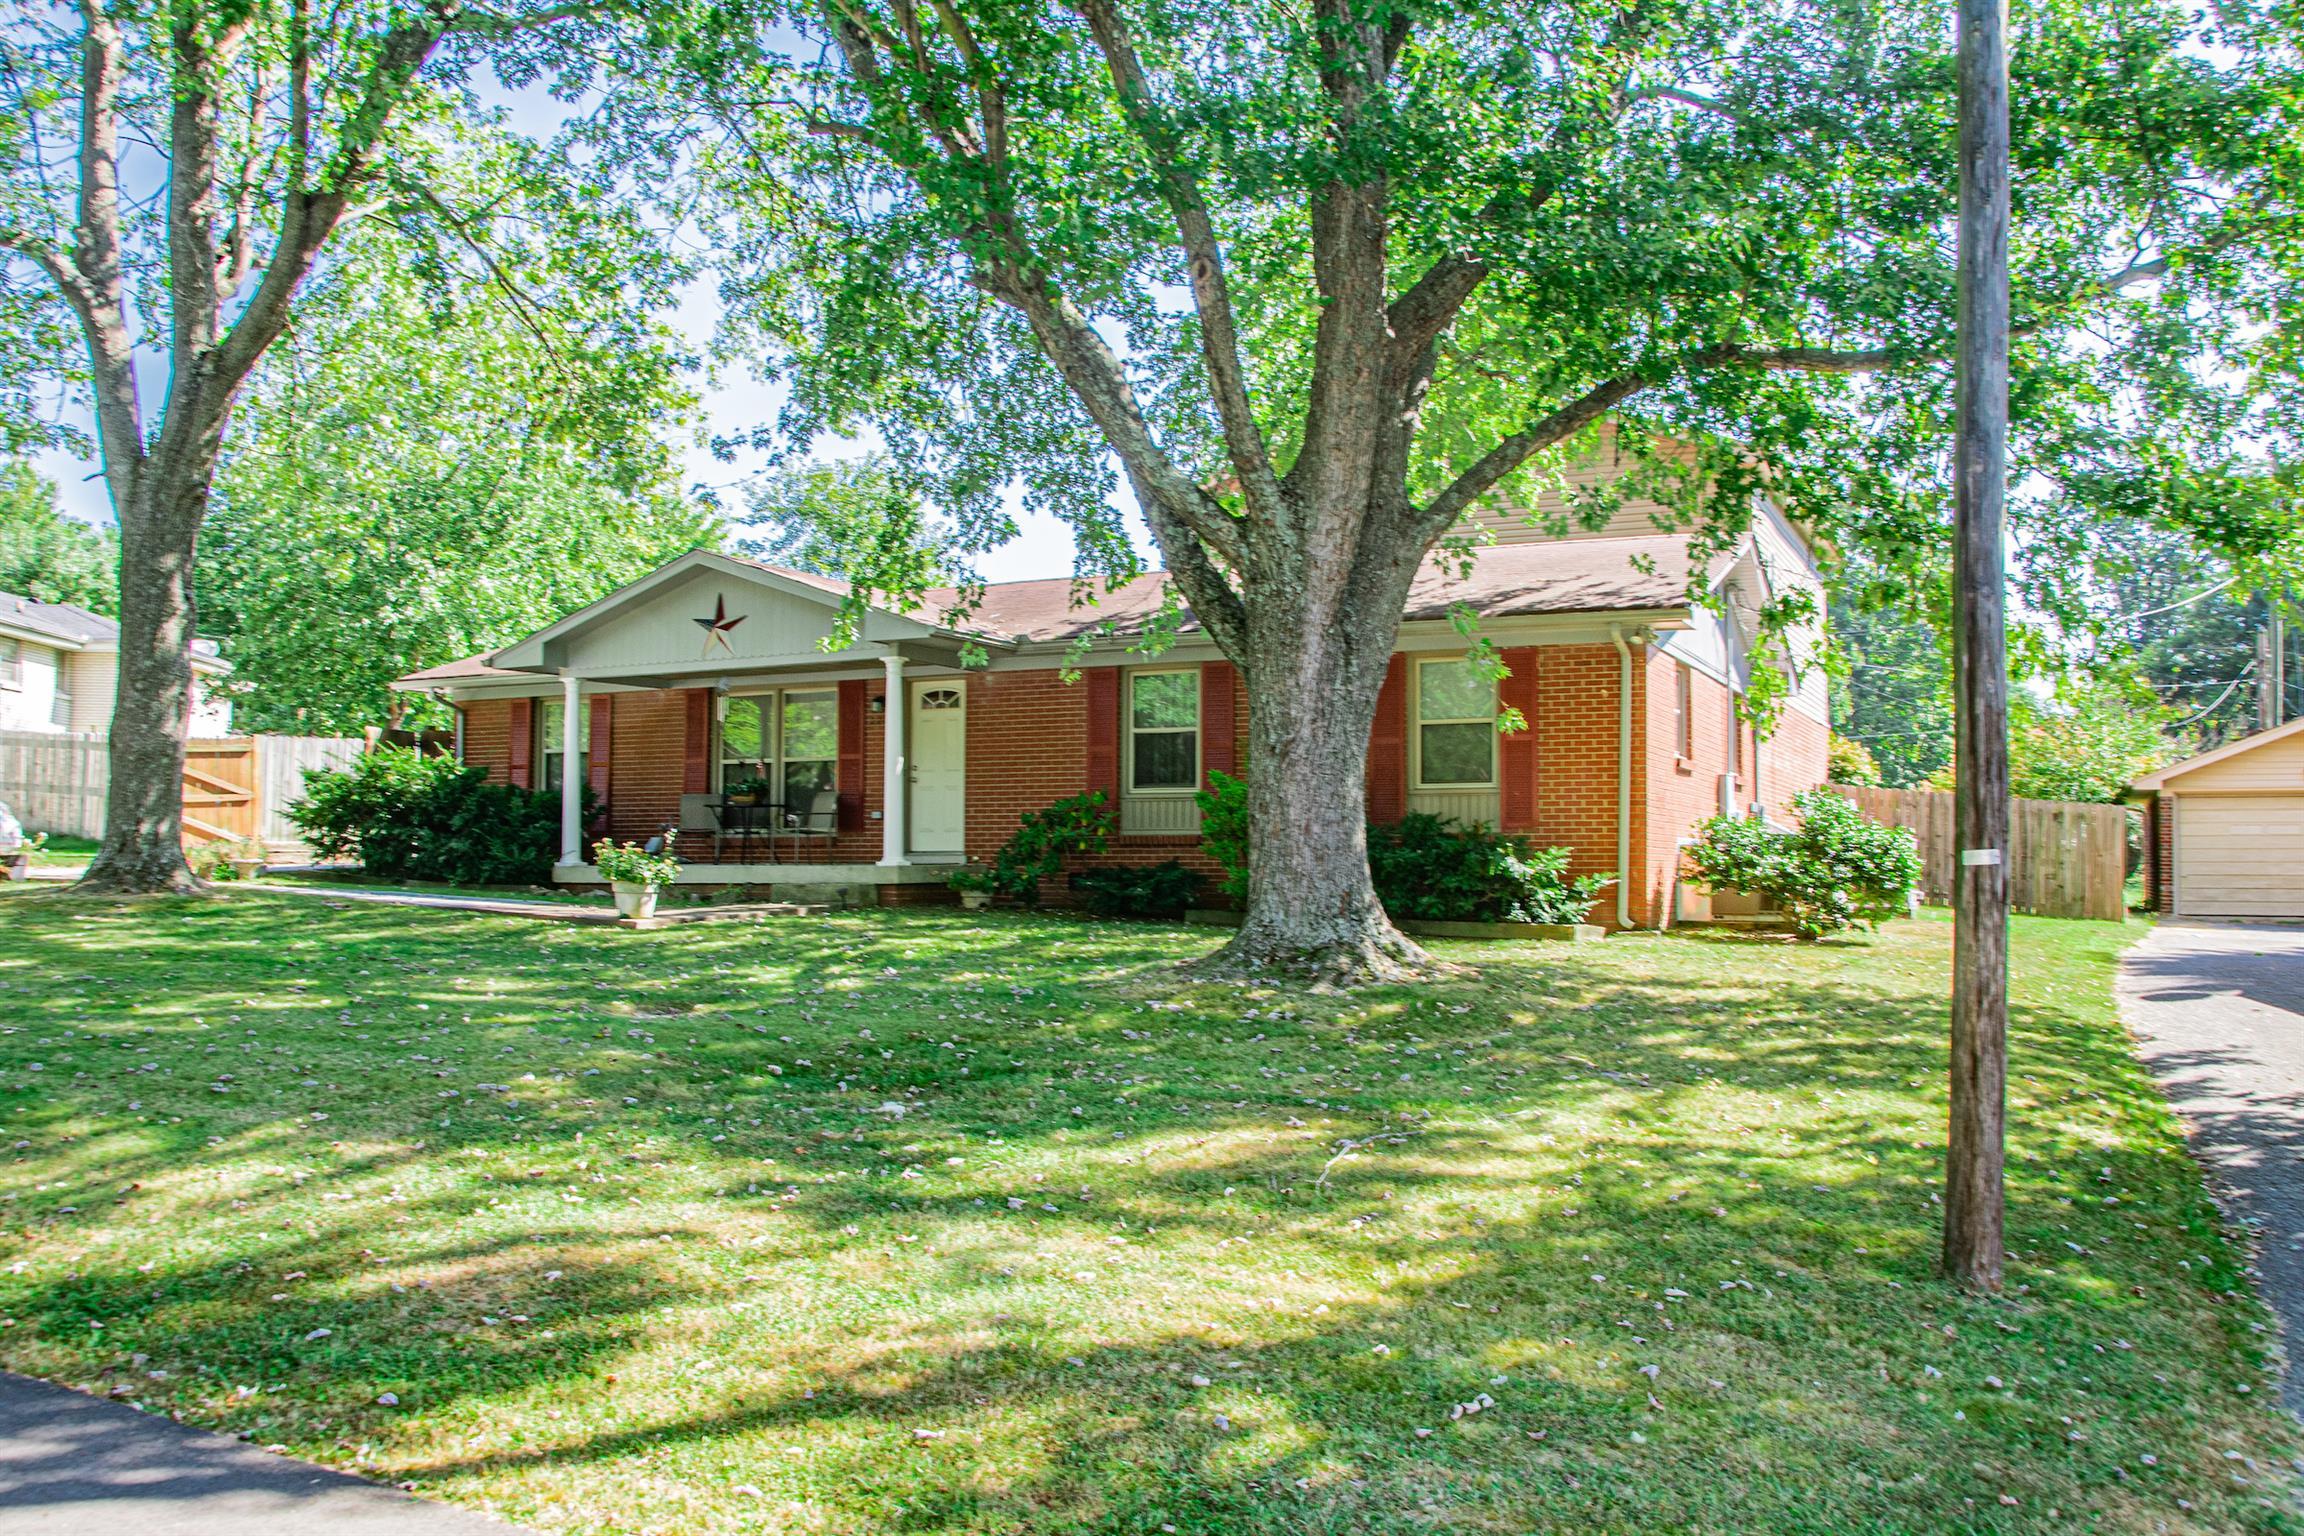 $242,500 - 4Br/2Ba -  for Sale in Pleasant Hill Subd, Springfield